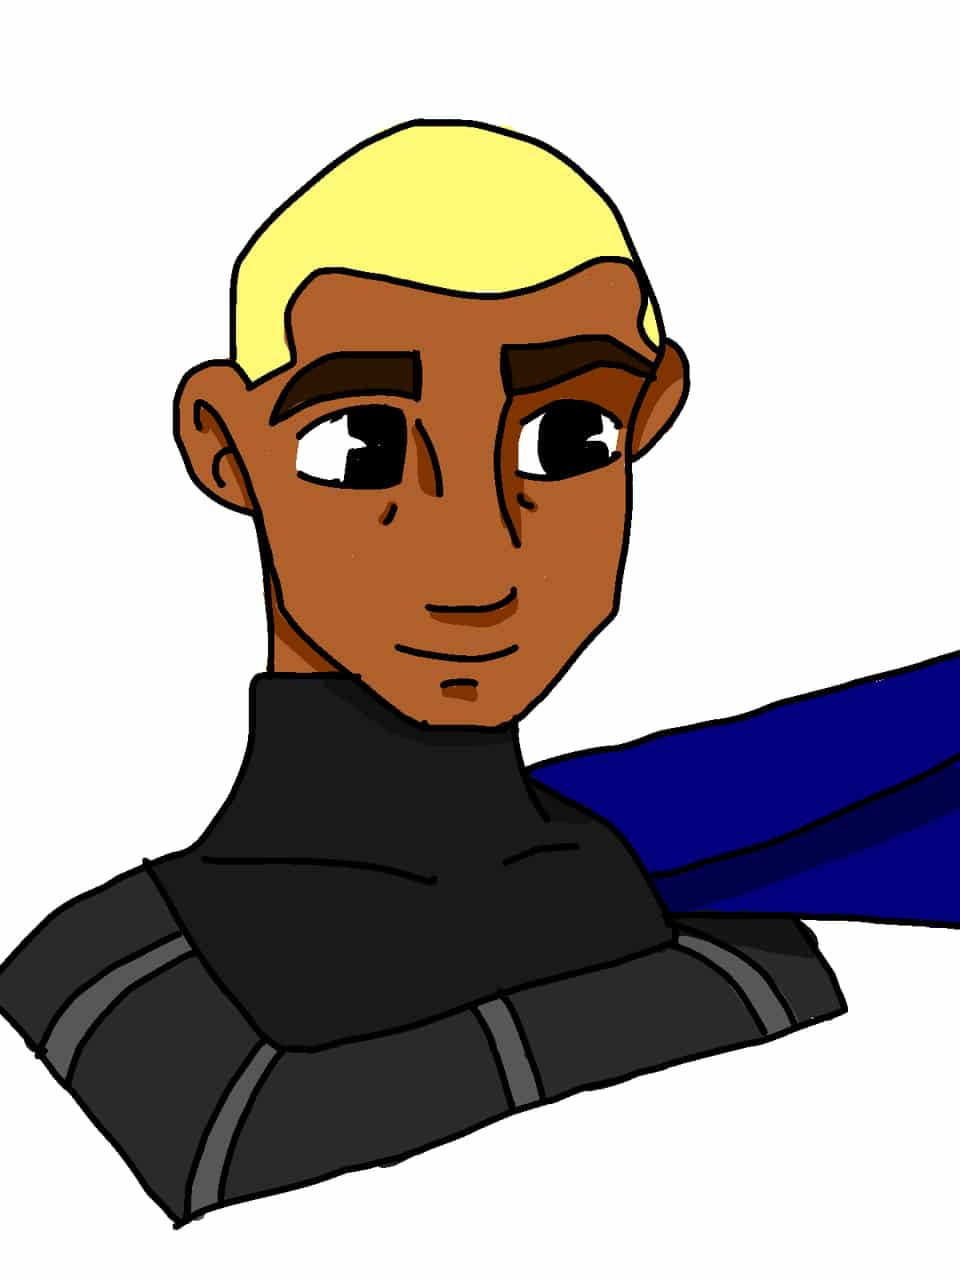 Captain Rex!! Illust of HeadHonchoCodex armor HeadHonchoCodex fanart CloneWars trooper Rex oc Hela STARWARS 501